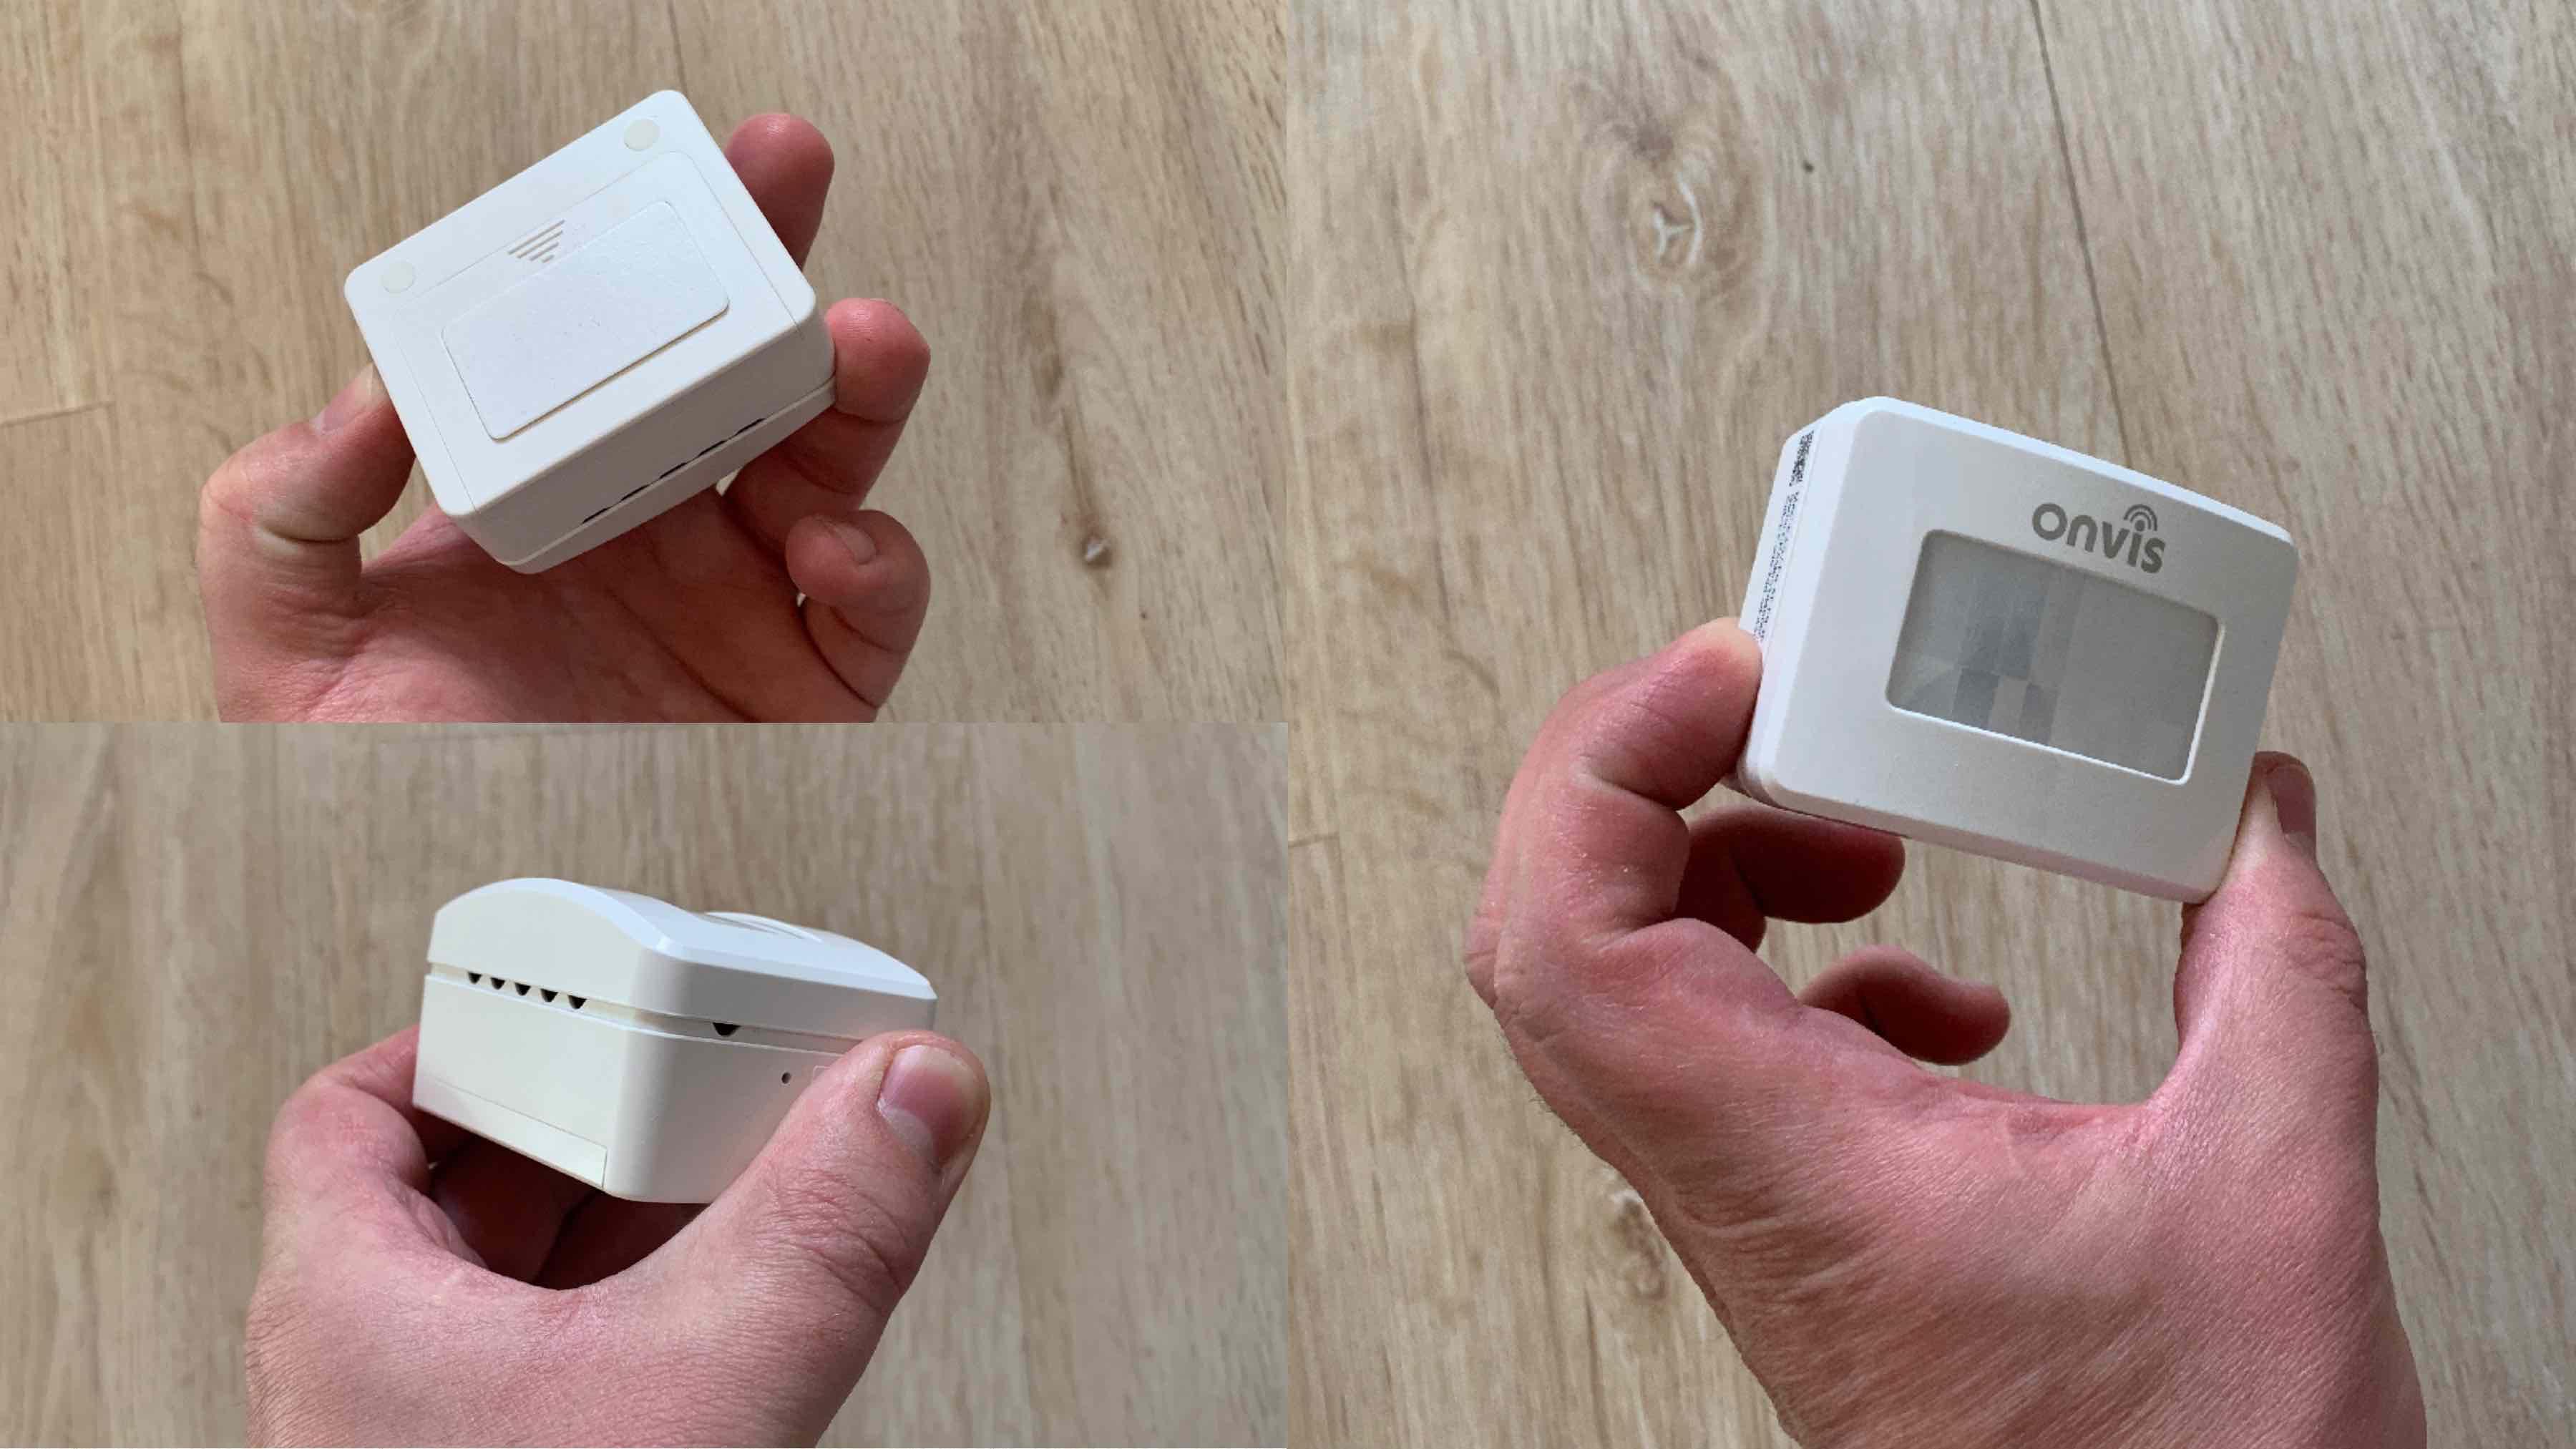 Onvis_Motion_Sensor_Bewegung_HomeKit6 Bewegungssensor von Onvis - ein cleveres 3-in-1 HomeKit-Gerät